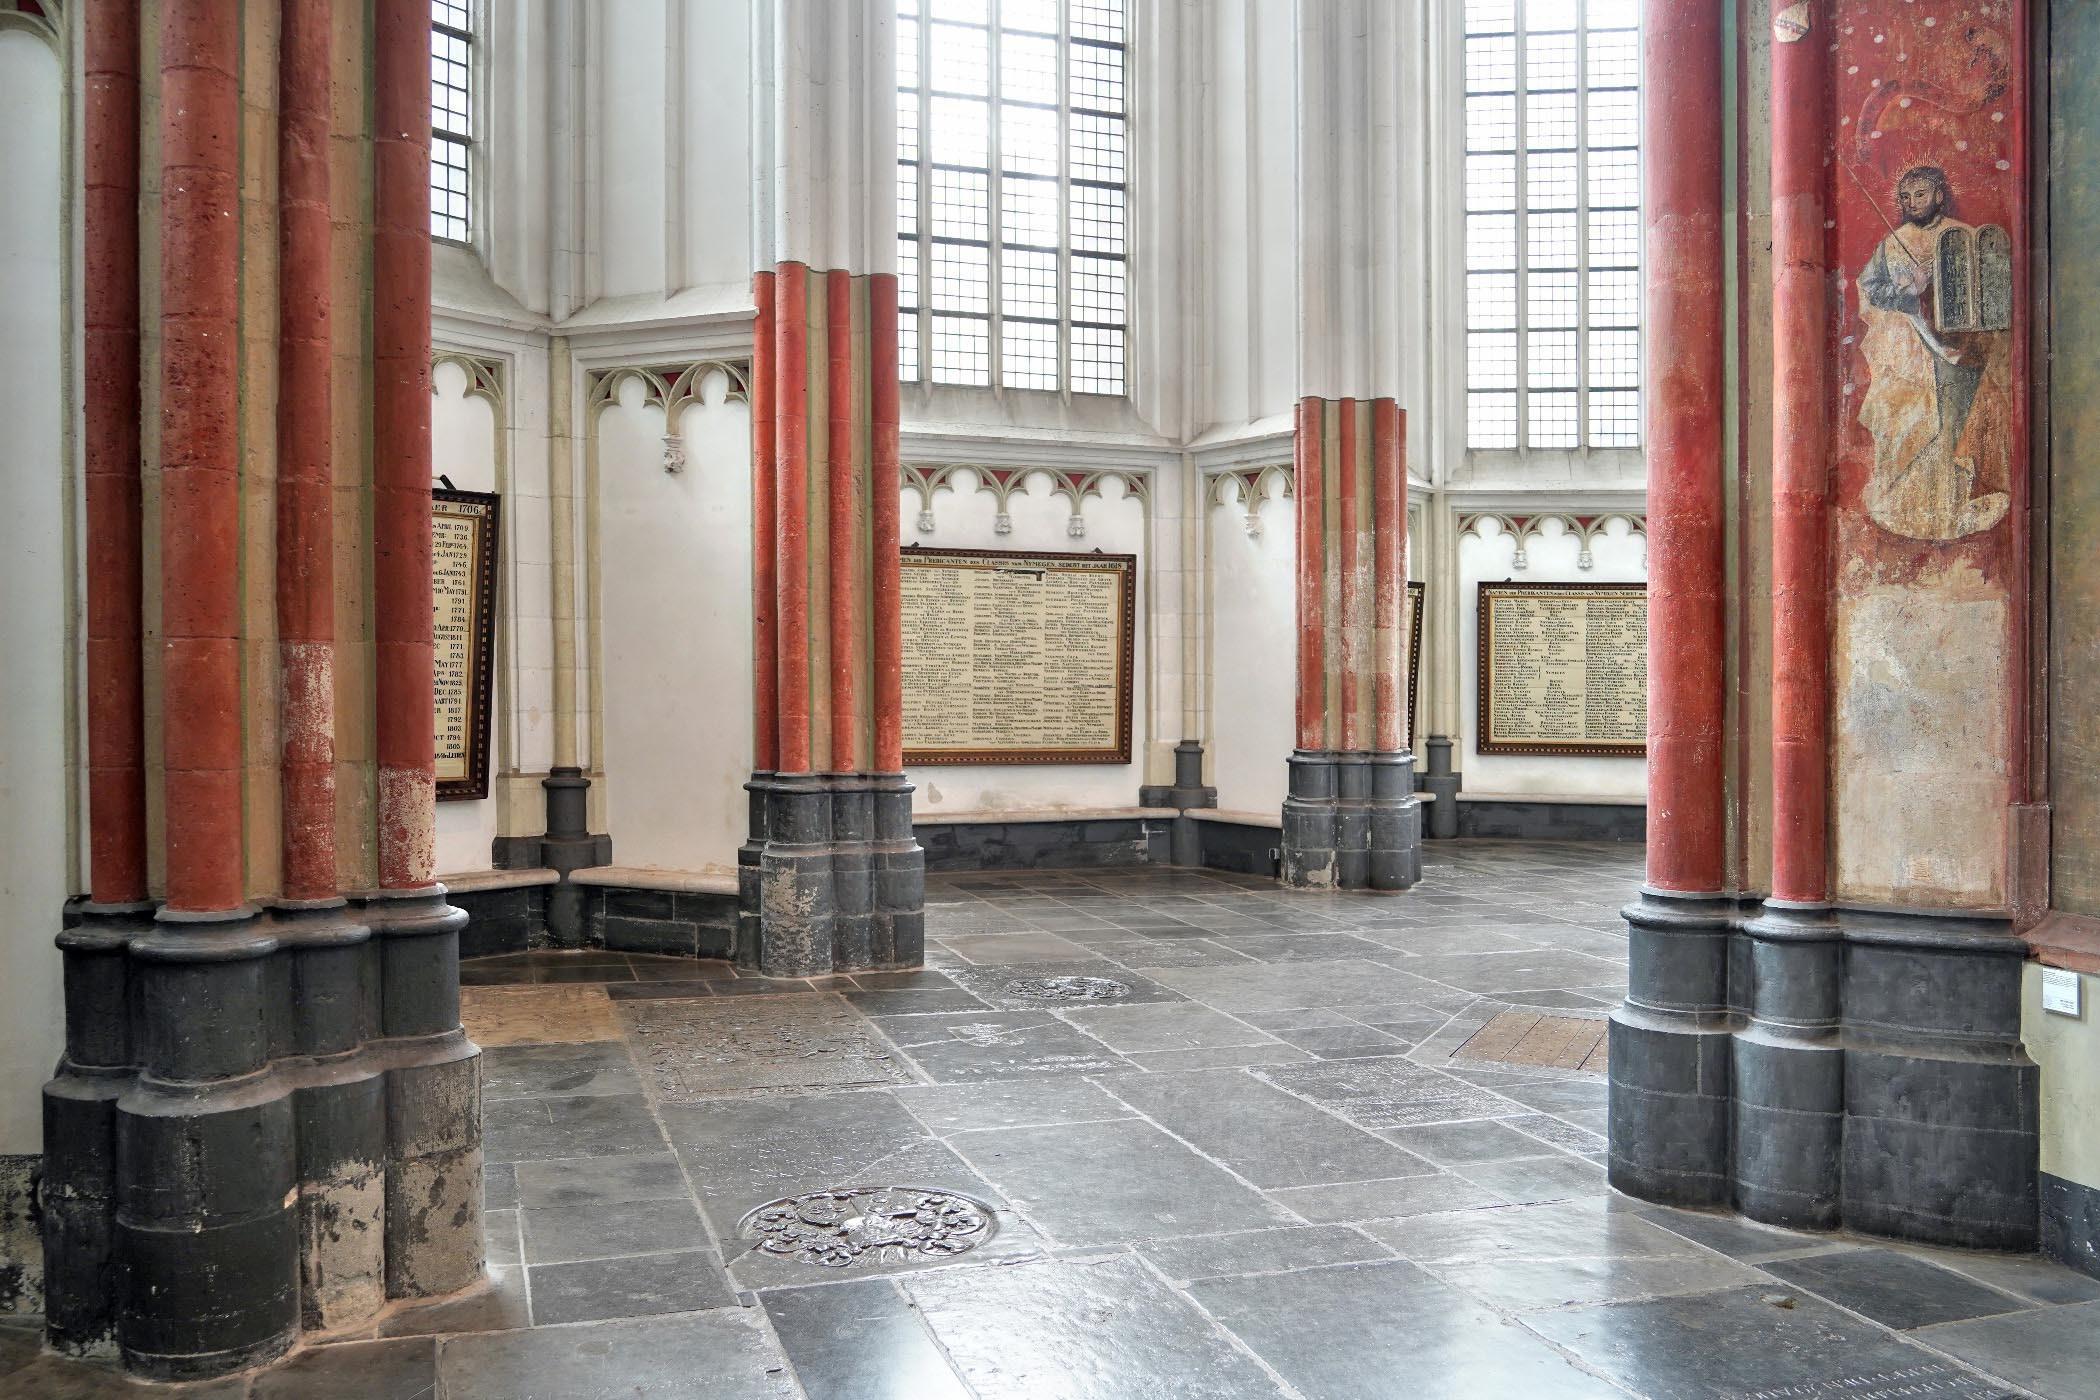 Kooromgang Stevenskerk met muurschildering